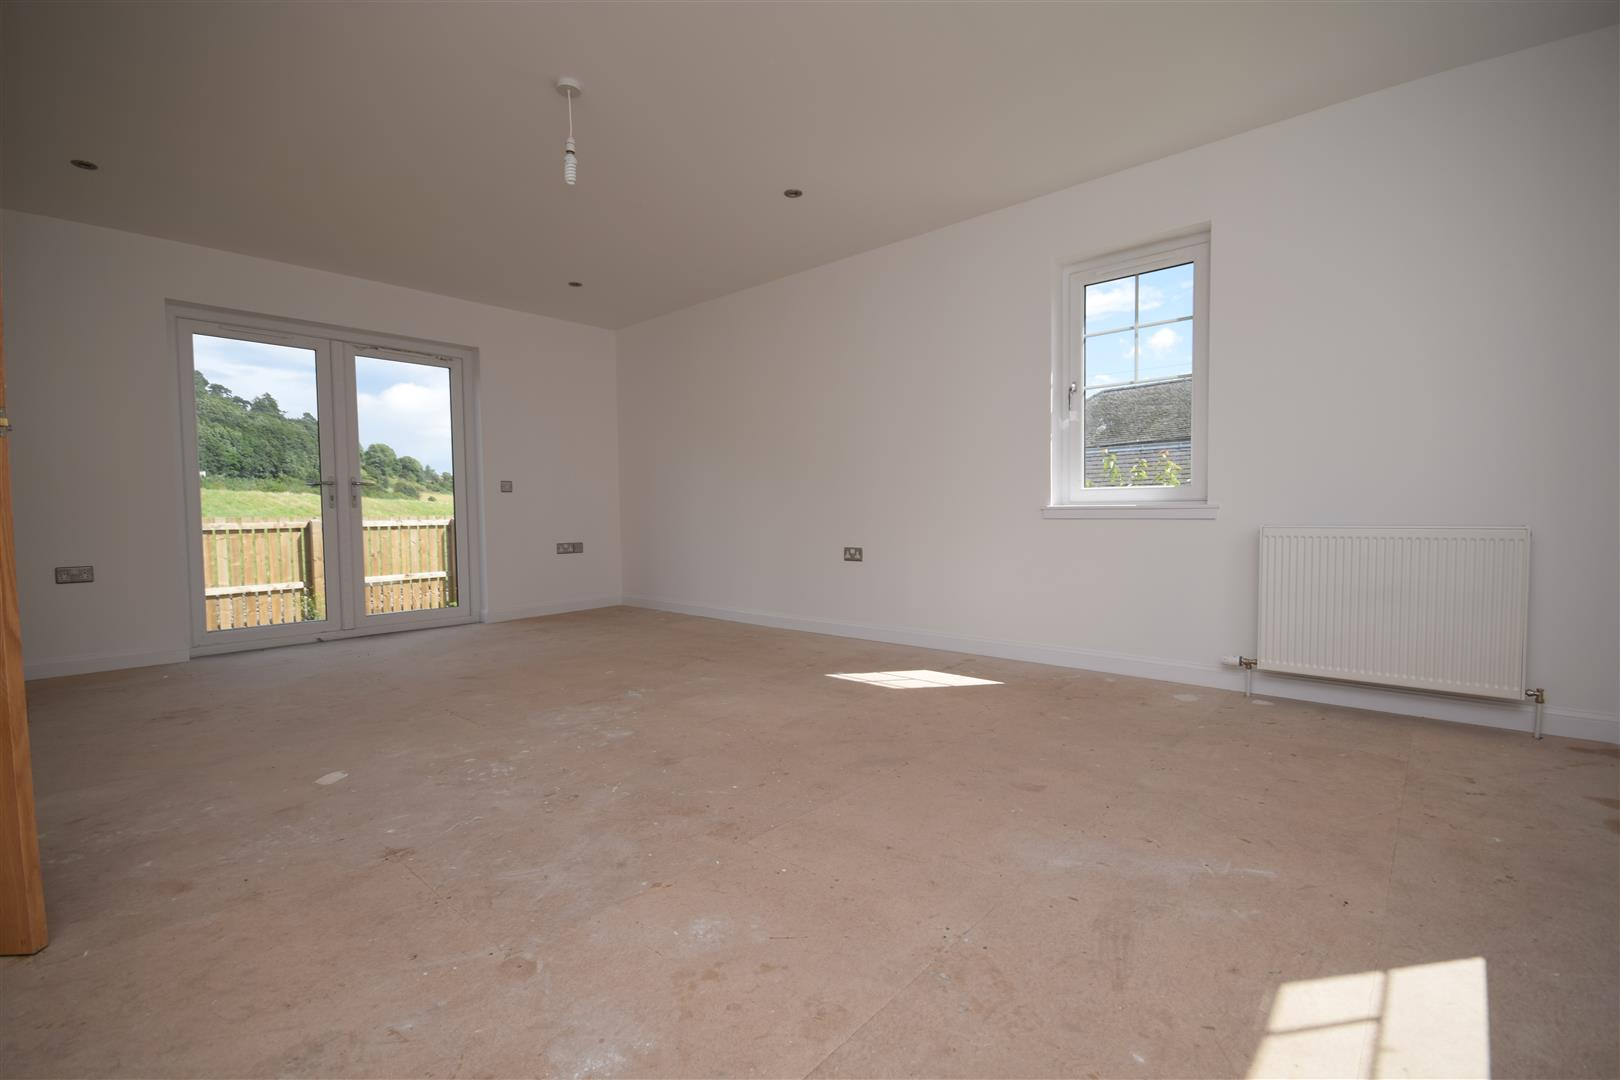 The Steadings, Plot 2, New Development, Abernyte, Perth, Perthshire, PH14 9ST, UK